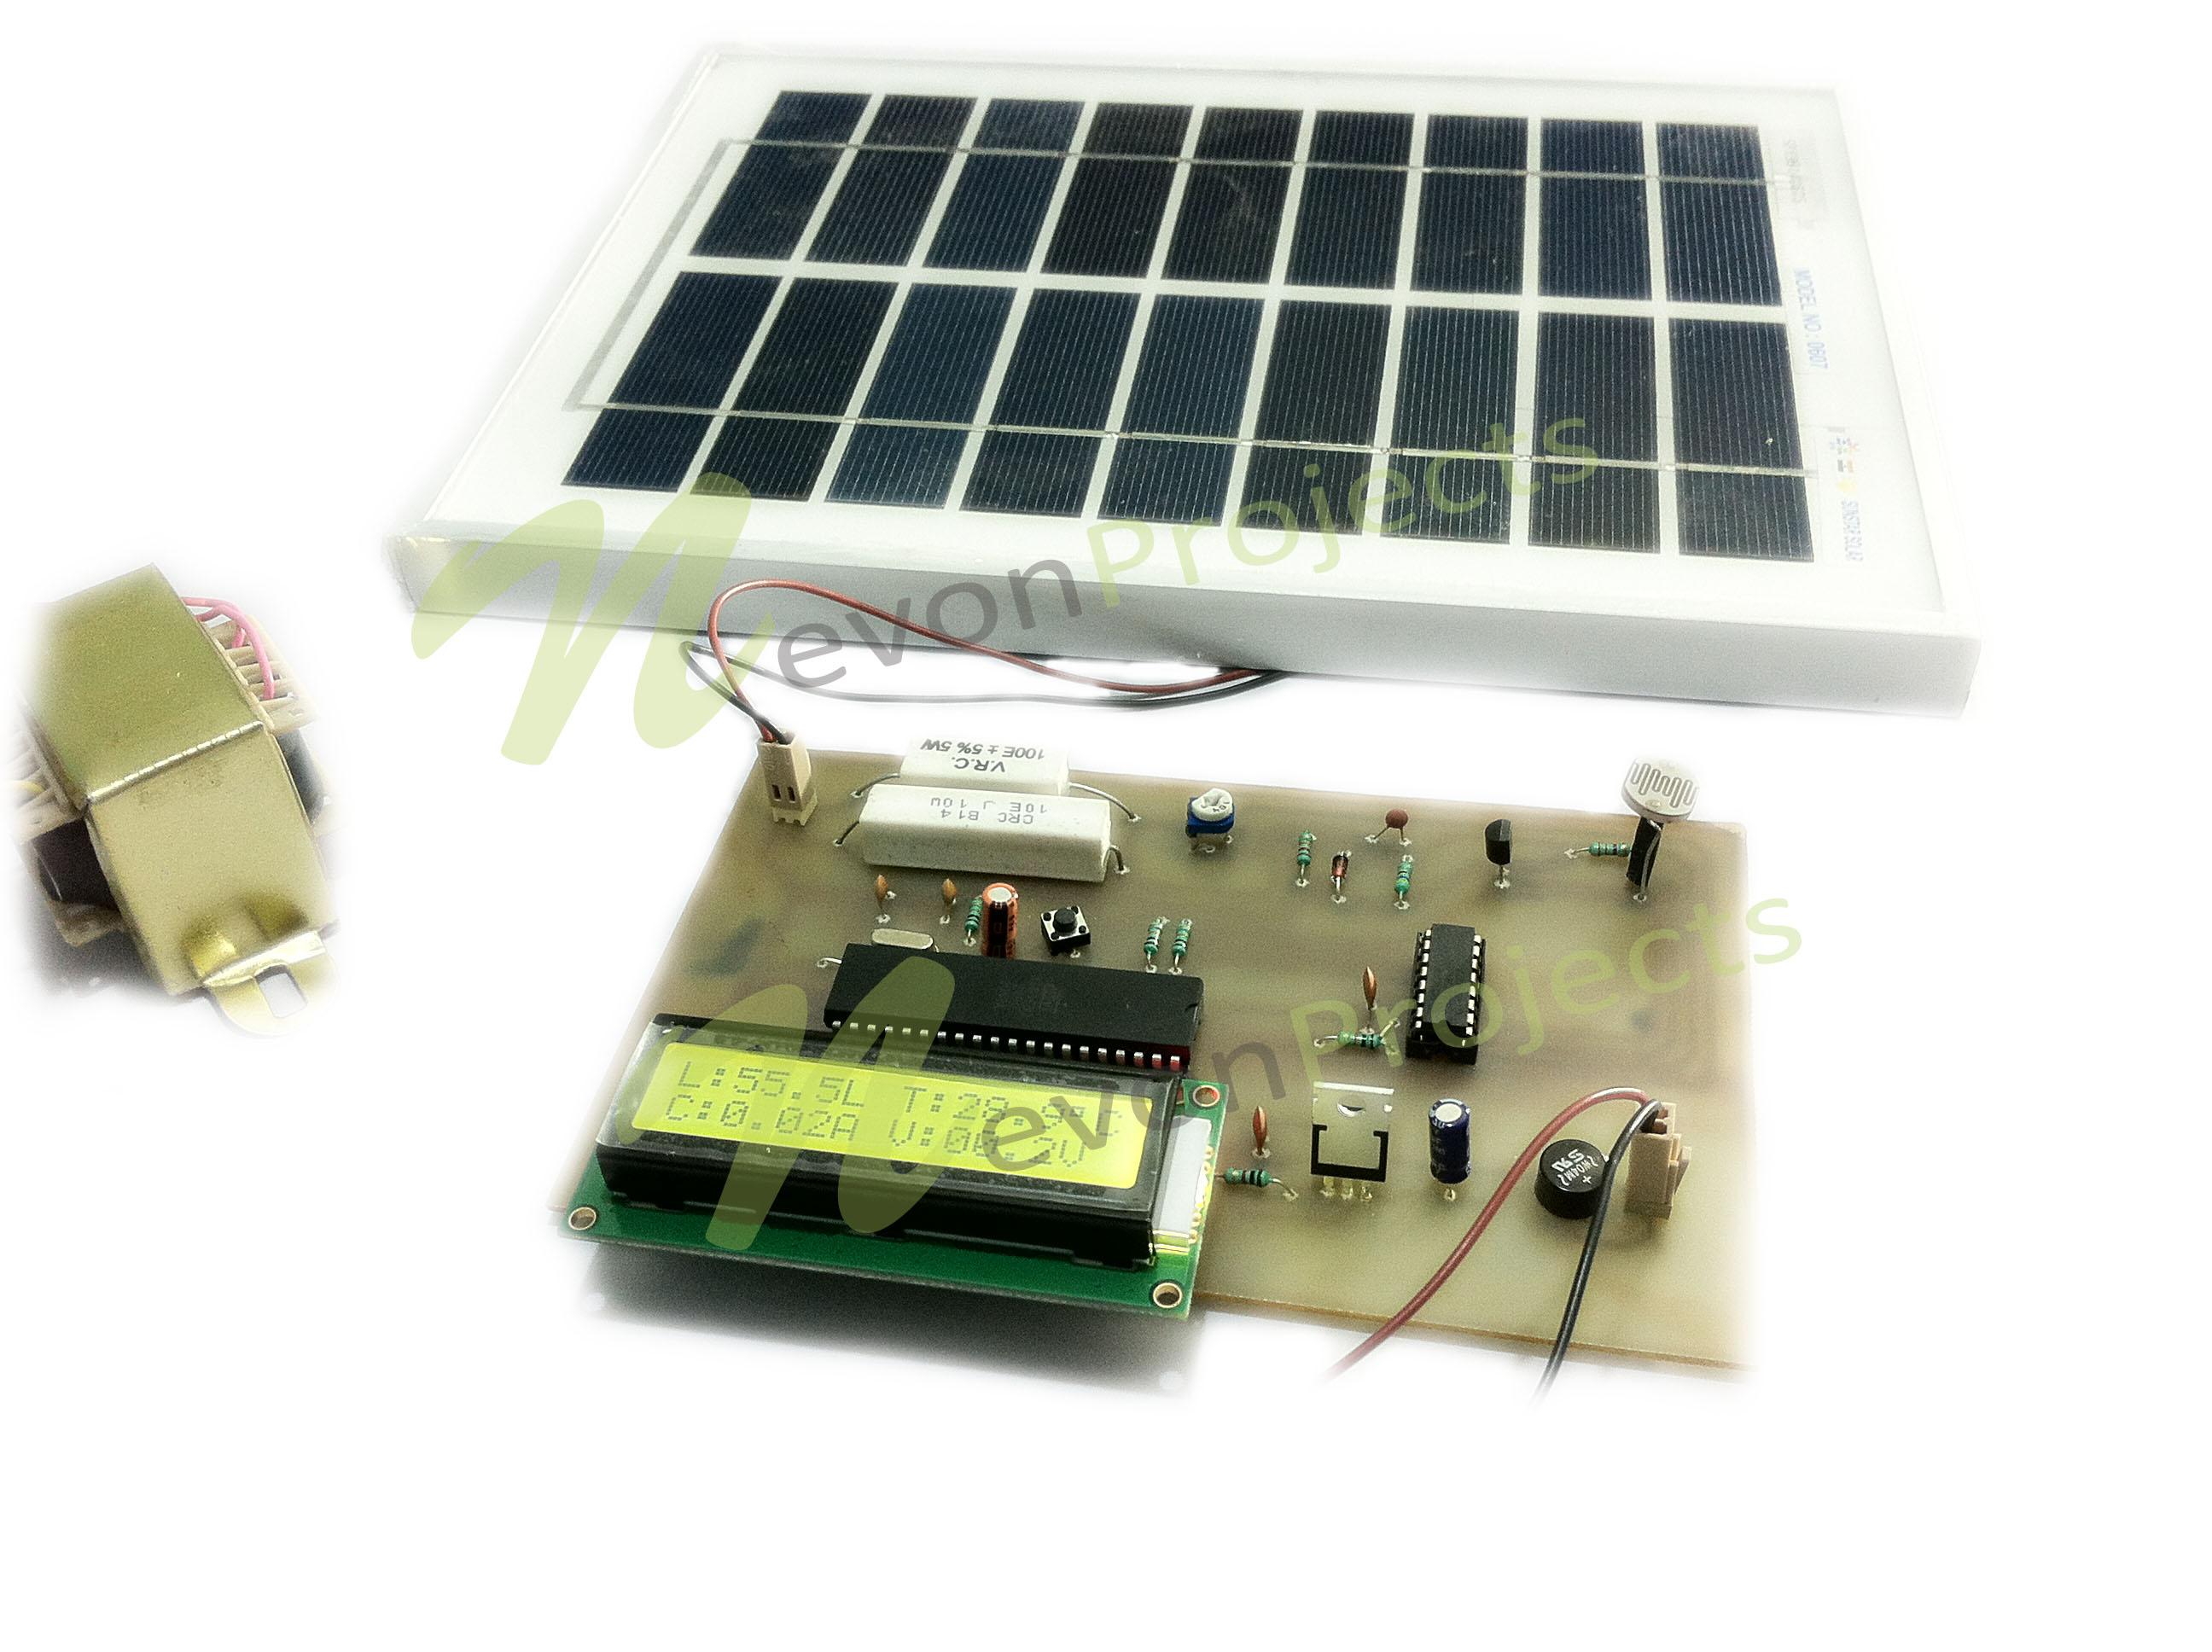 Phenomenal System To Measure Solar Power Wiring Cloud Xempagosophoxytasticioscodnessplanboapumohammedshrineorg